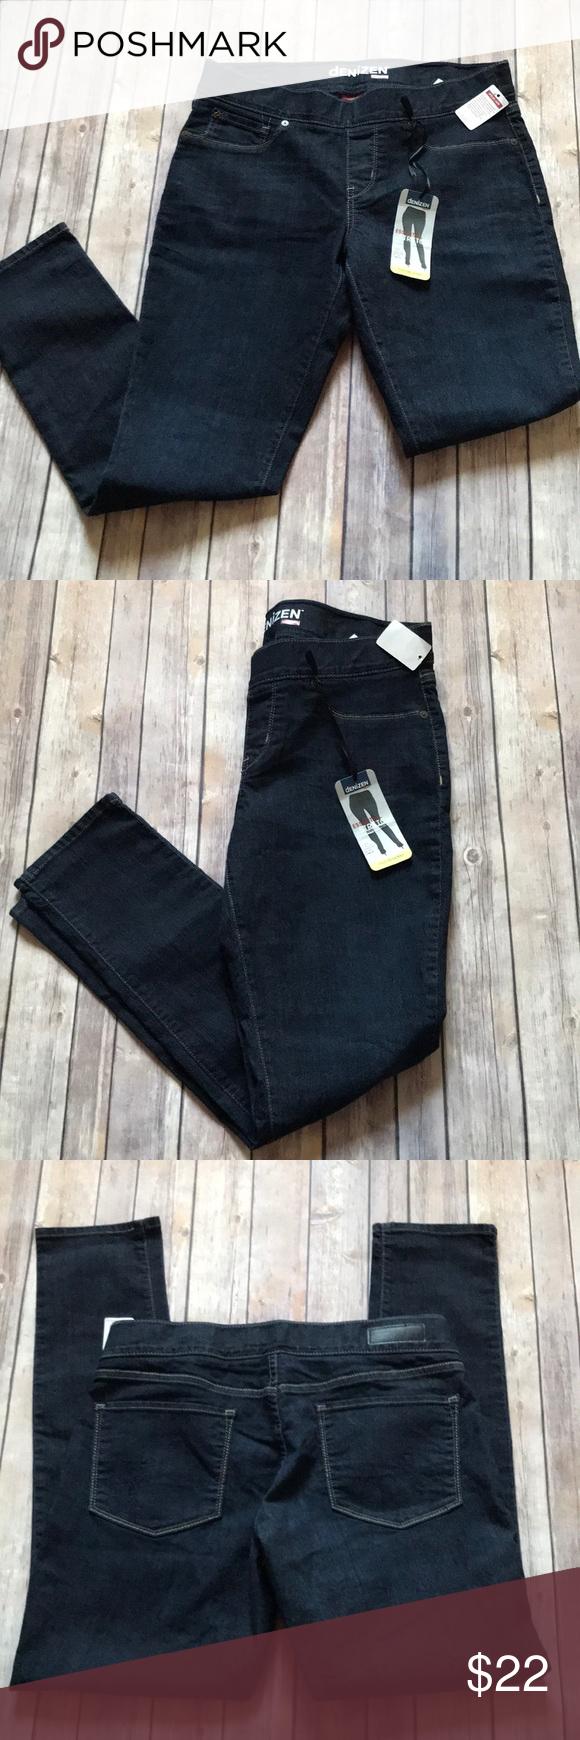 Denizen Denim Pinterest Levi's Nwt Modern Skinny Jeans OCzUqRw